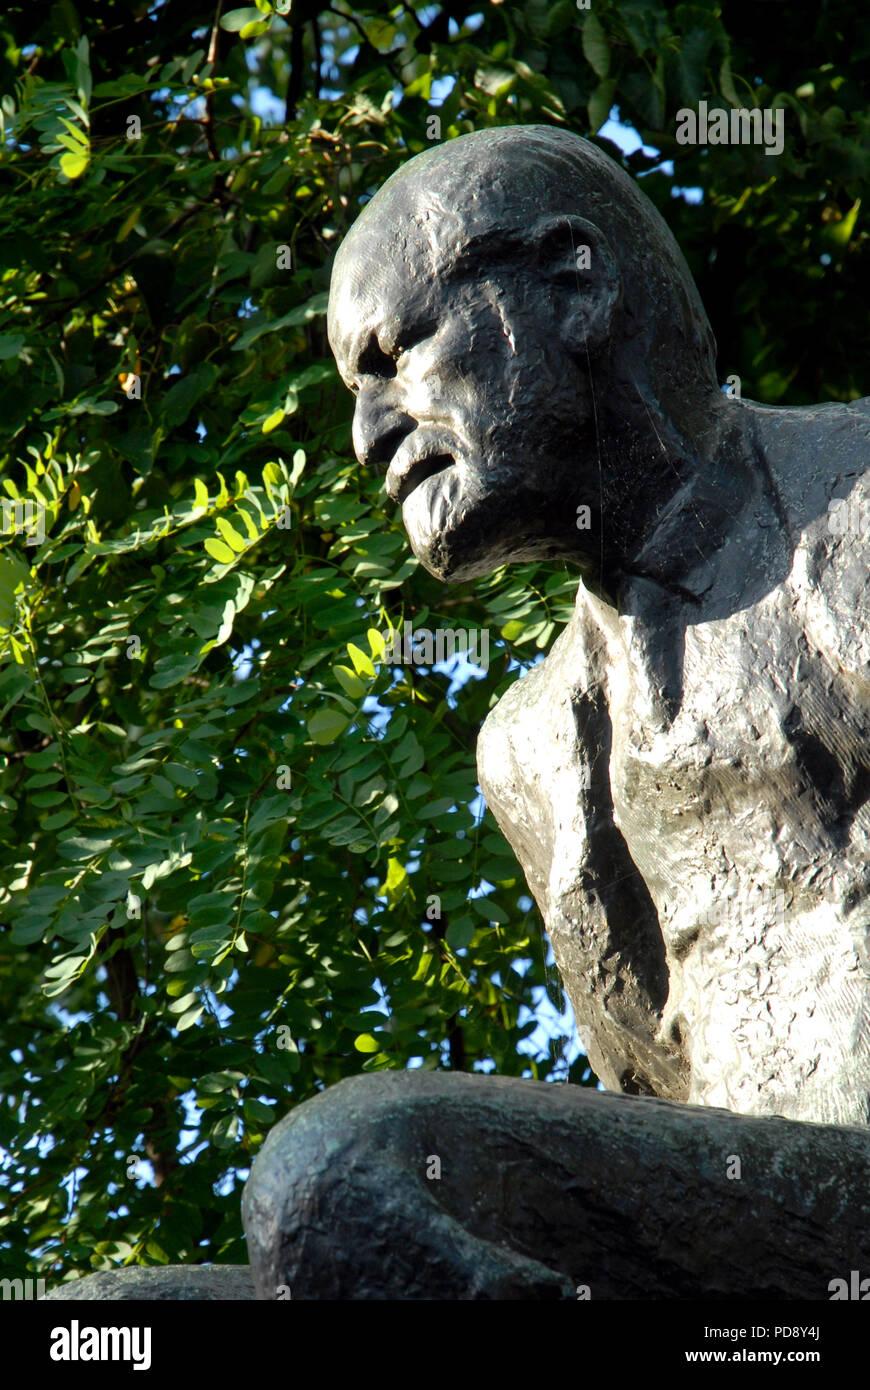 Sigmund Freud statue in Fitzjohn's Avenue, Hampstead, London - Stock Image